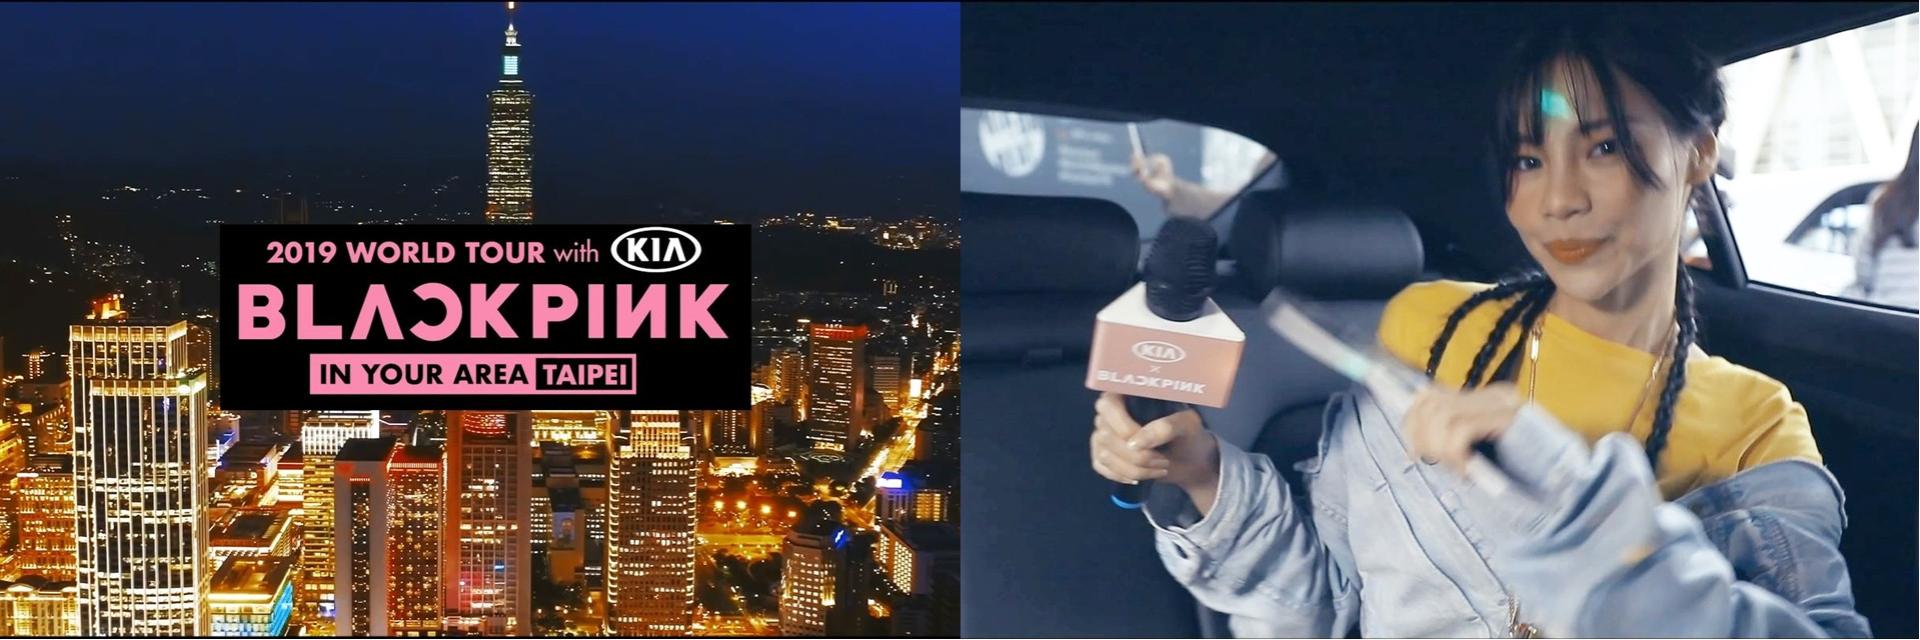 2019 World Tour With KIA  BLACKPINK In Your Area 世界巡迴演唱會  韓國潮模徐熙真 獨闖「KIA x BLACKPINK」邀請賽!